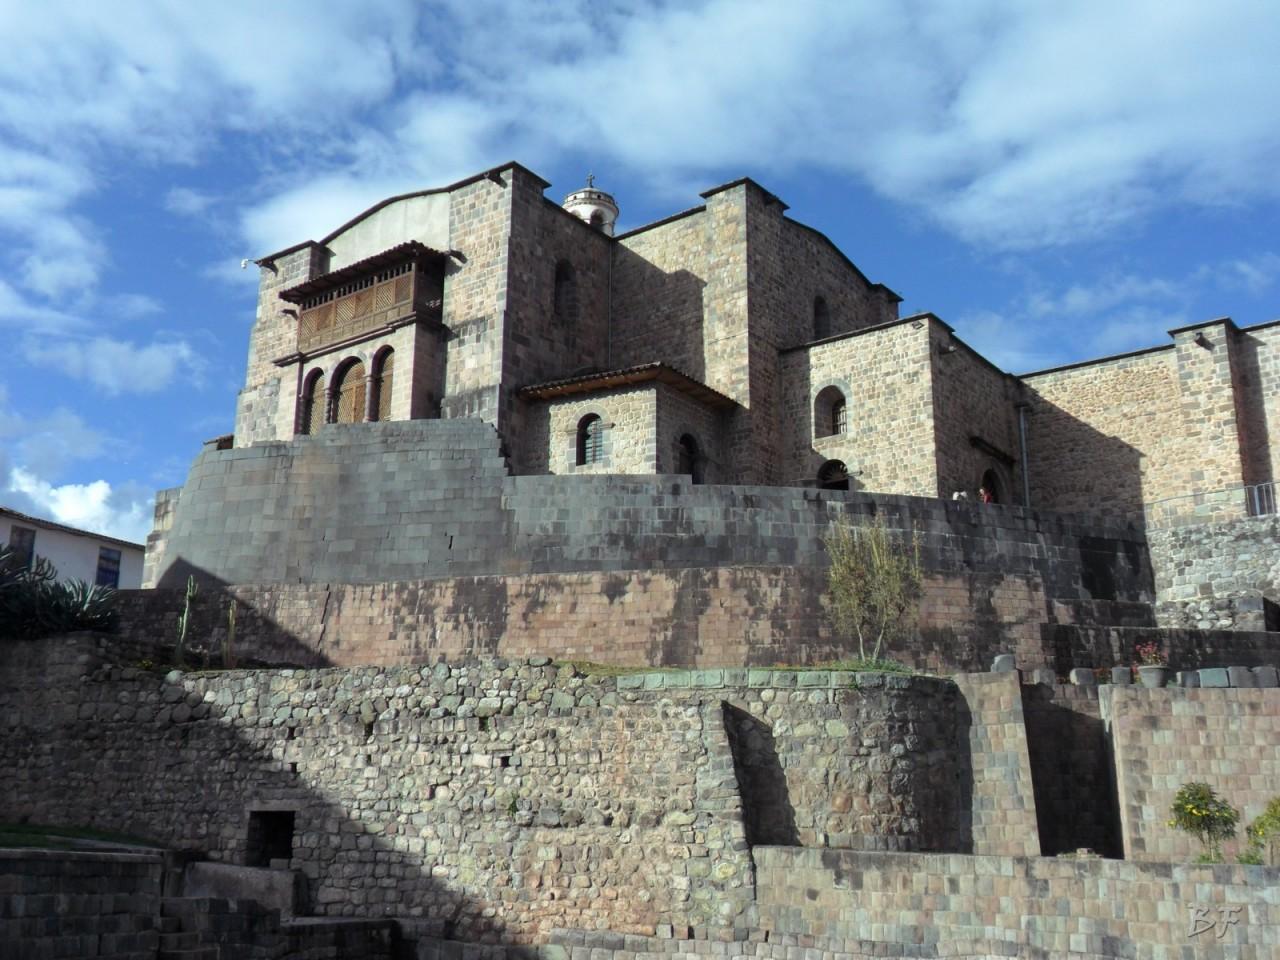 Mura-Poligonali-Megaliti-Tempio-Coricancha-Cusco-Perù-16